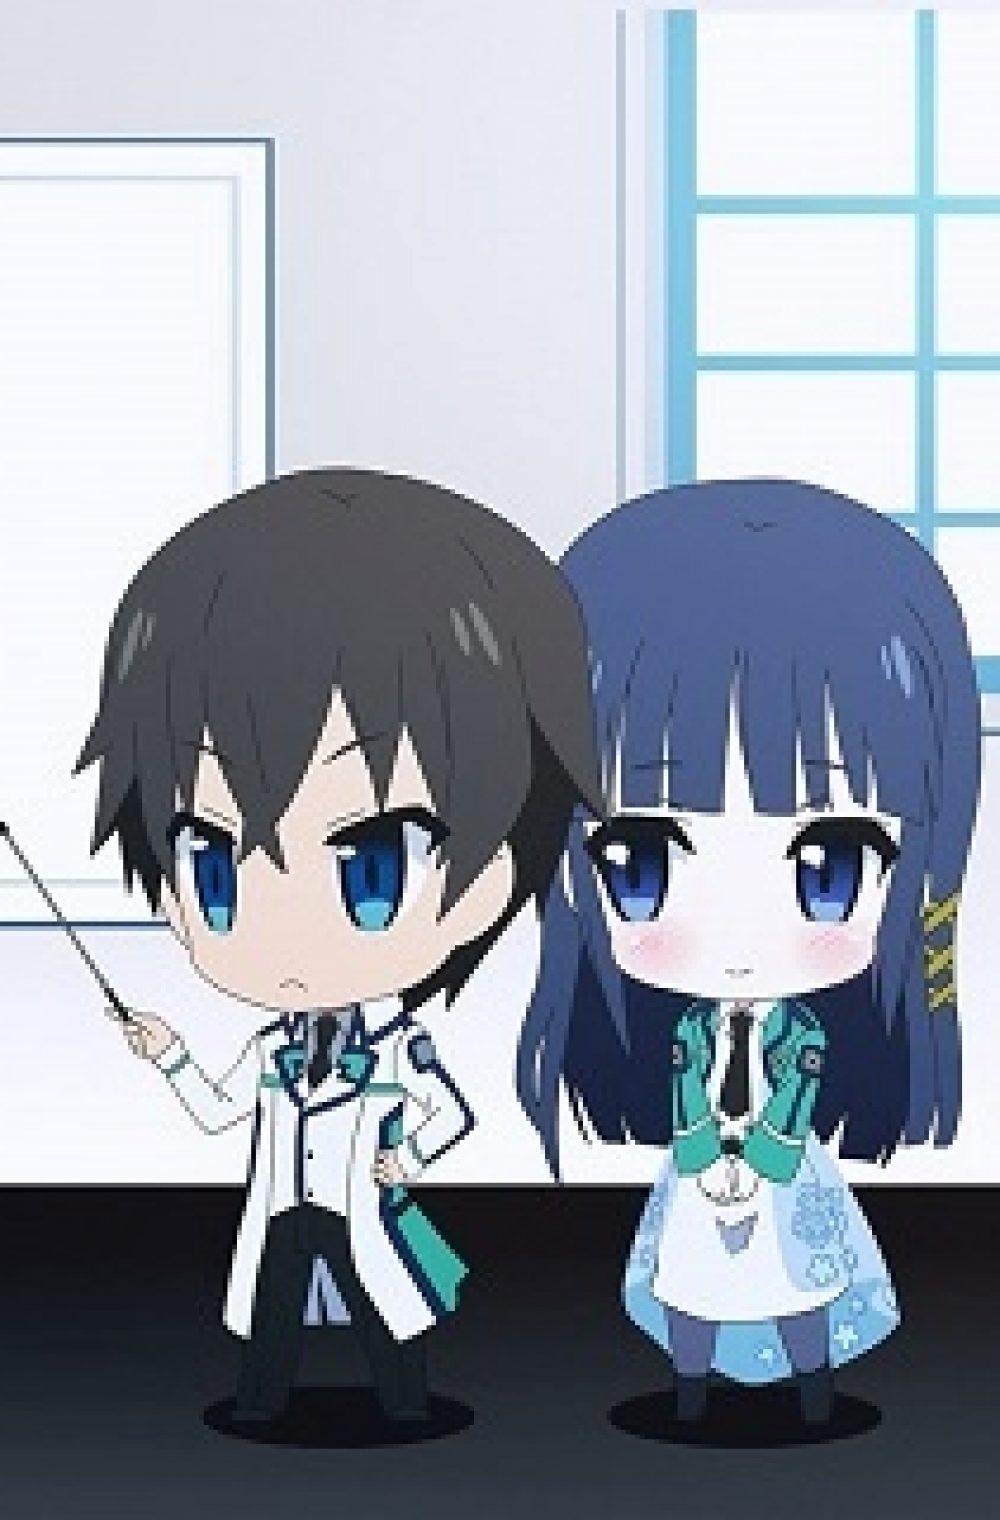 Mahouka Koukou no Rettousei: Yoku Wakaru Mahouka! (The Irregular at Magic High School Specials)